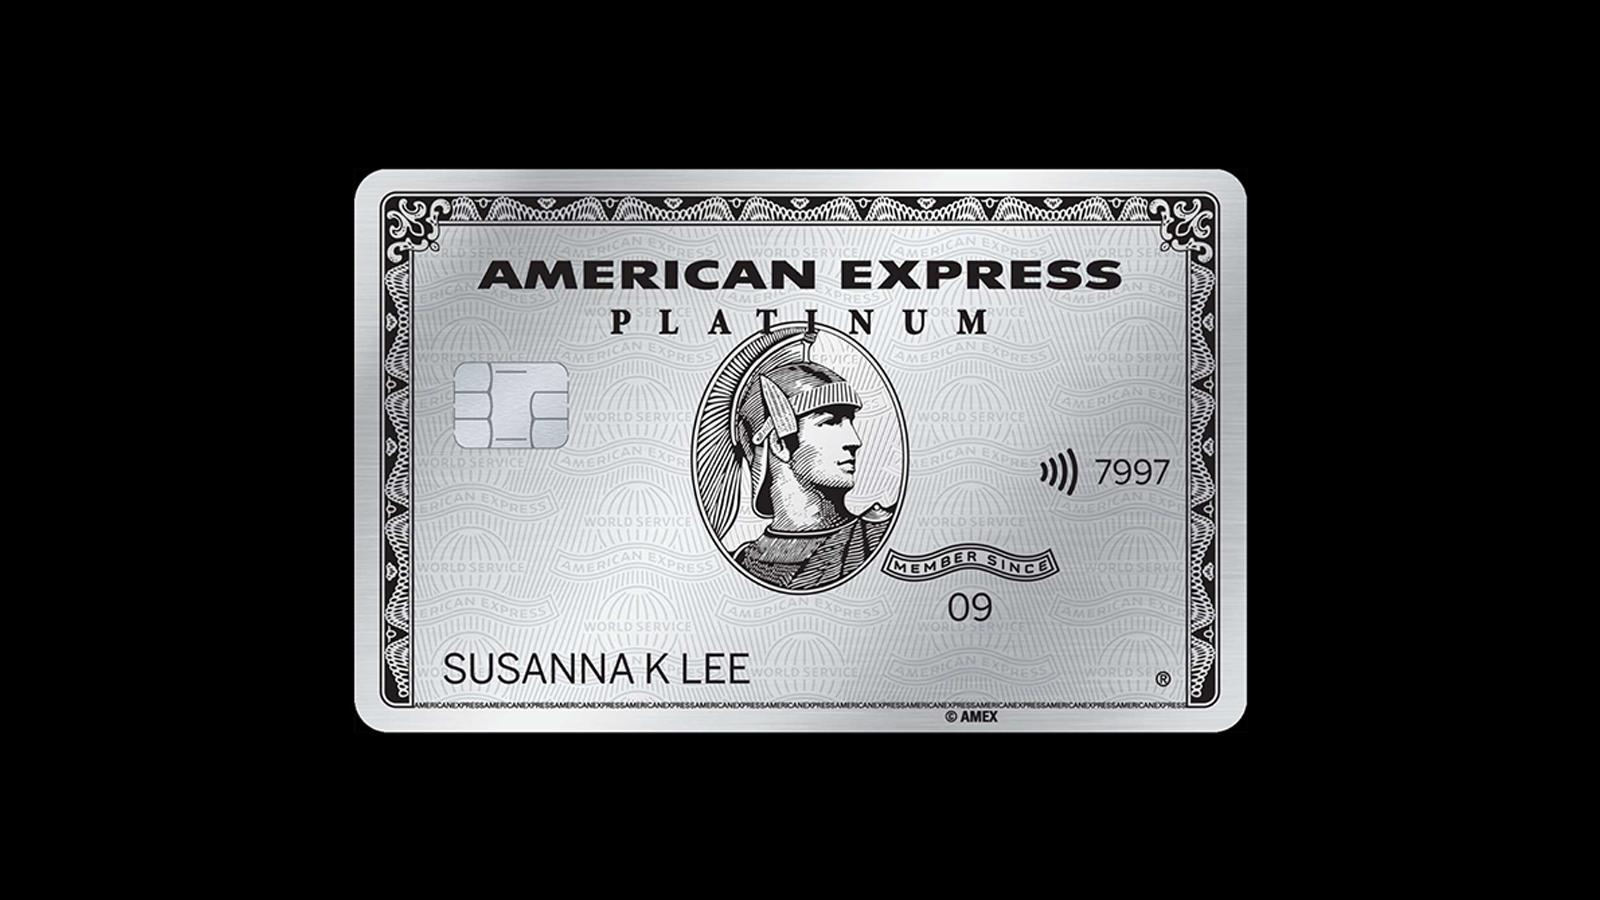 【American Express】AE Platinum Card(鋼卡)- 優惠整理一覽表   石先生部落